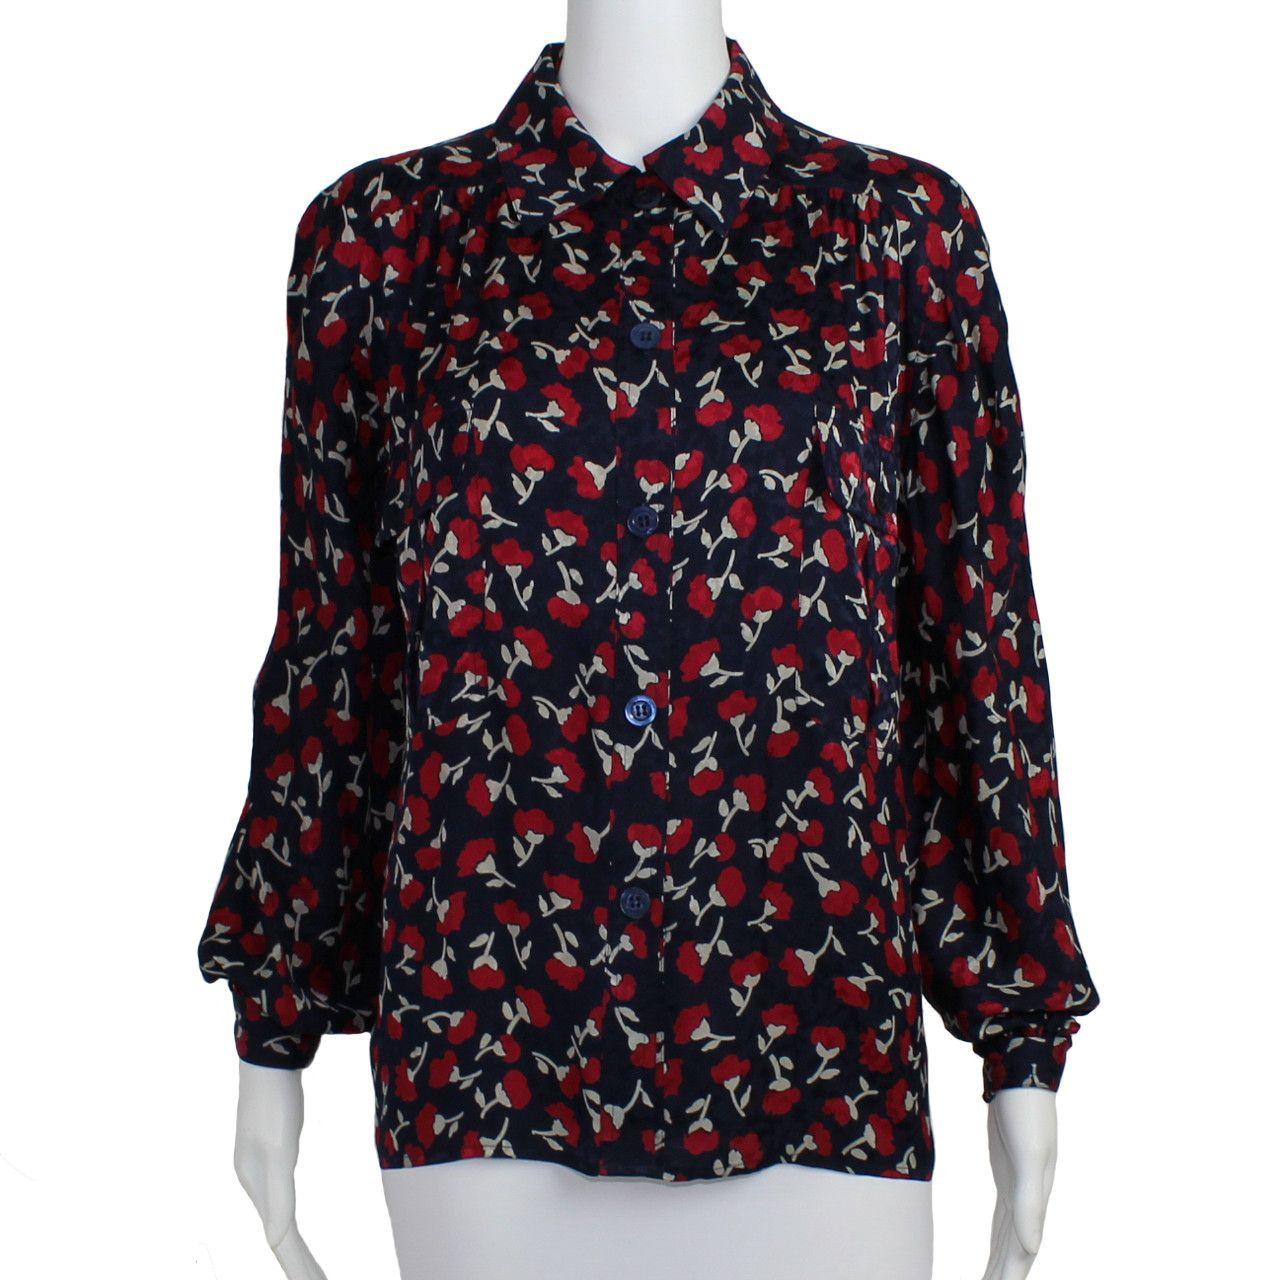 Vintage Silk Floral Blouse